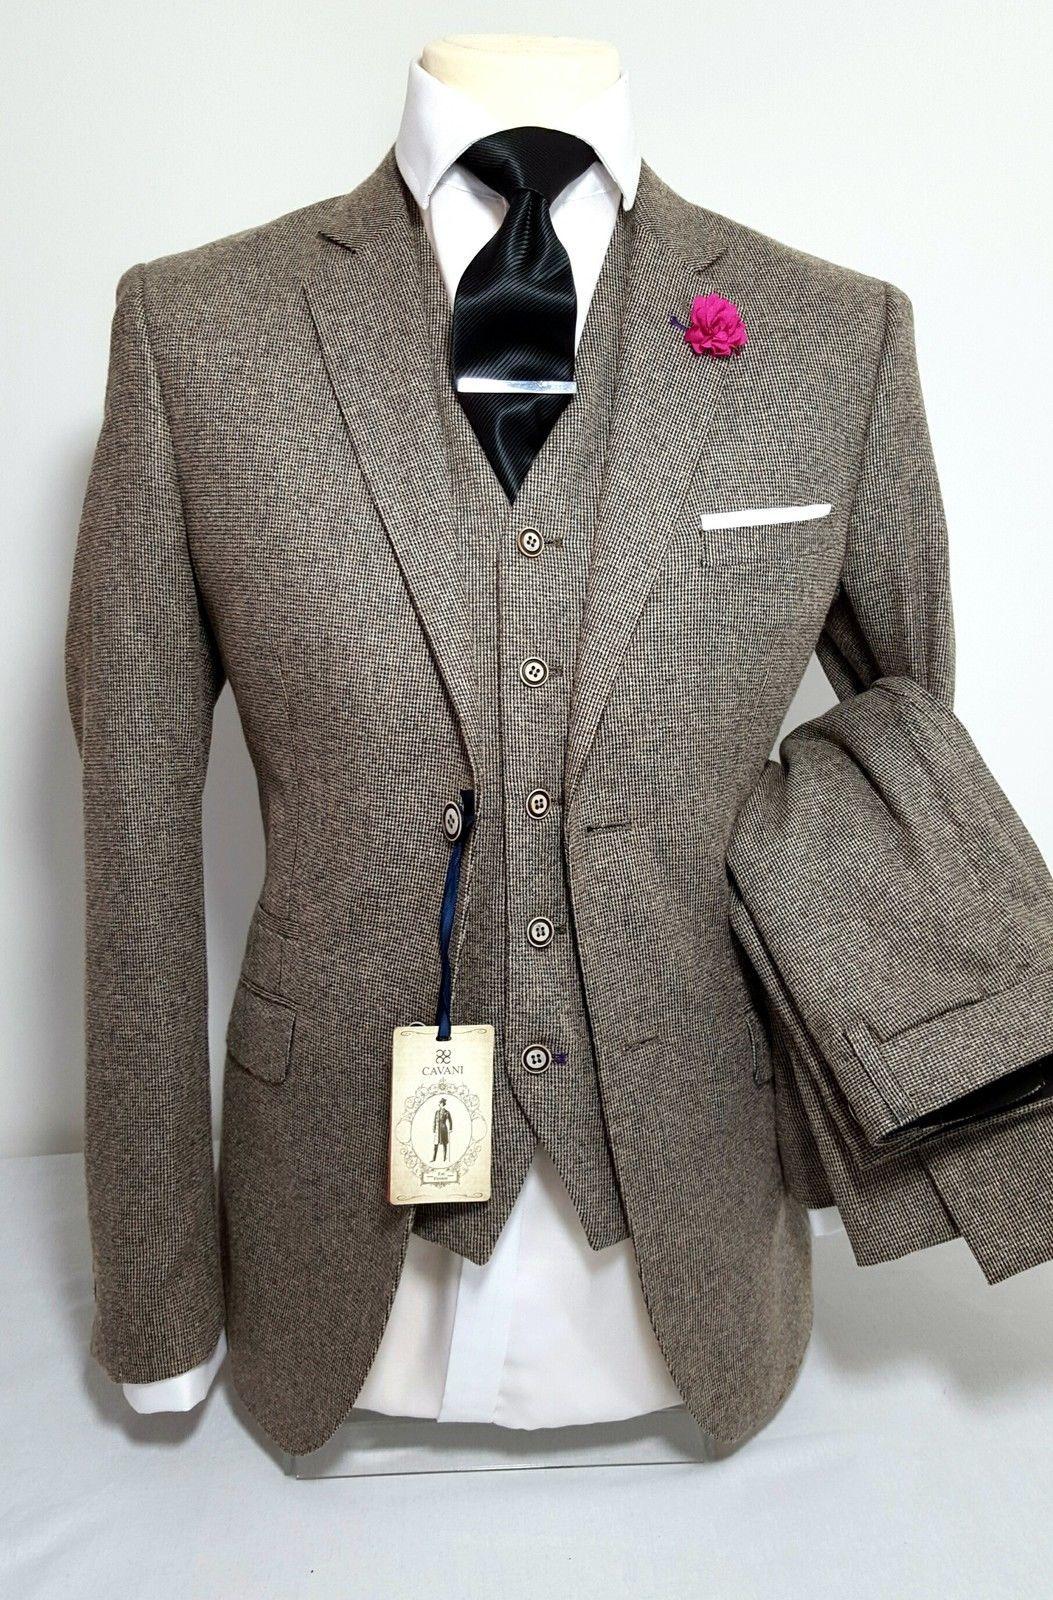 Mens Tan 3 Piece Tweed Suit Wedding Party Prom Tailored Smart Tweed Wedding Suits Tweed Suits Well Dressed Men